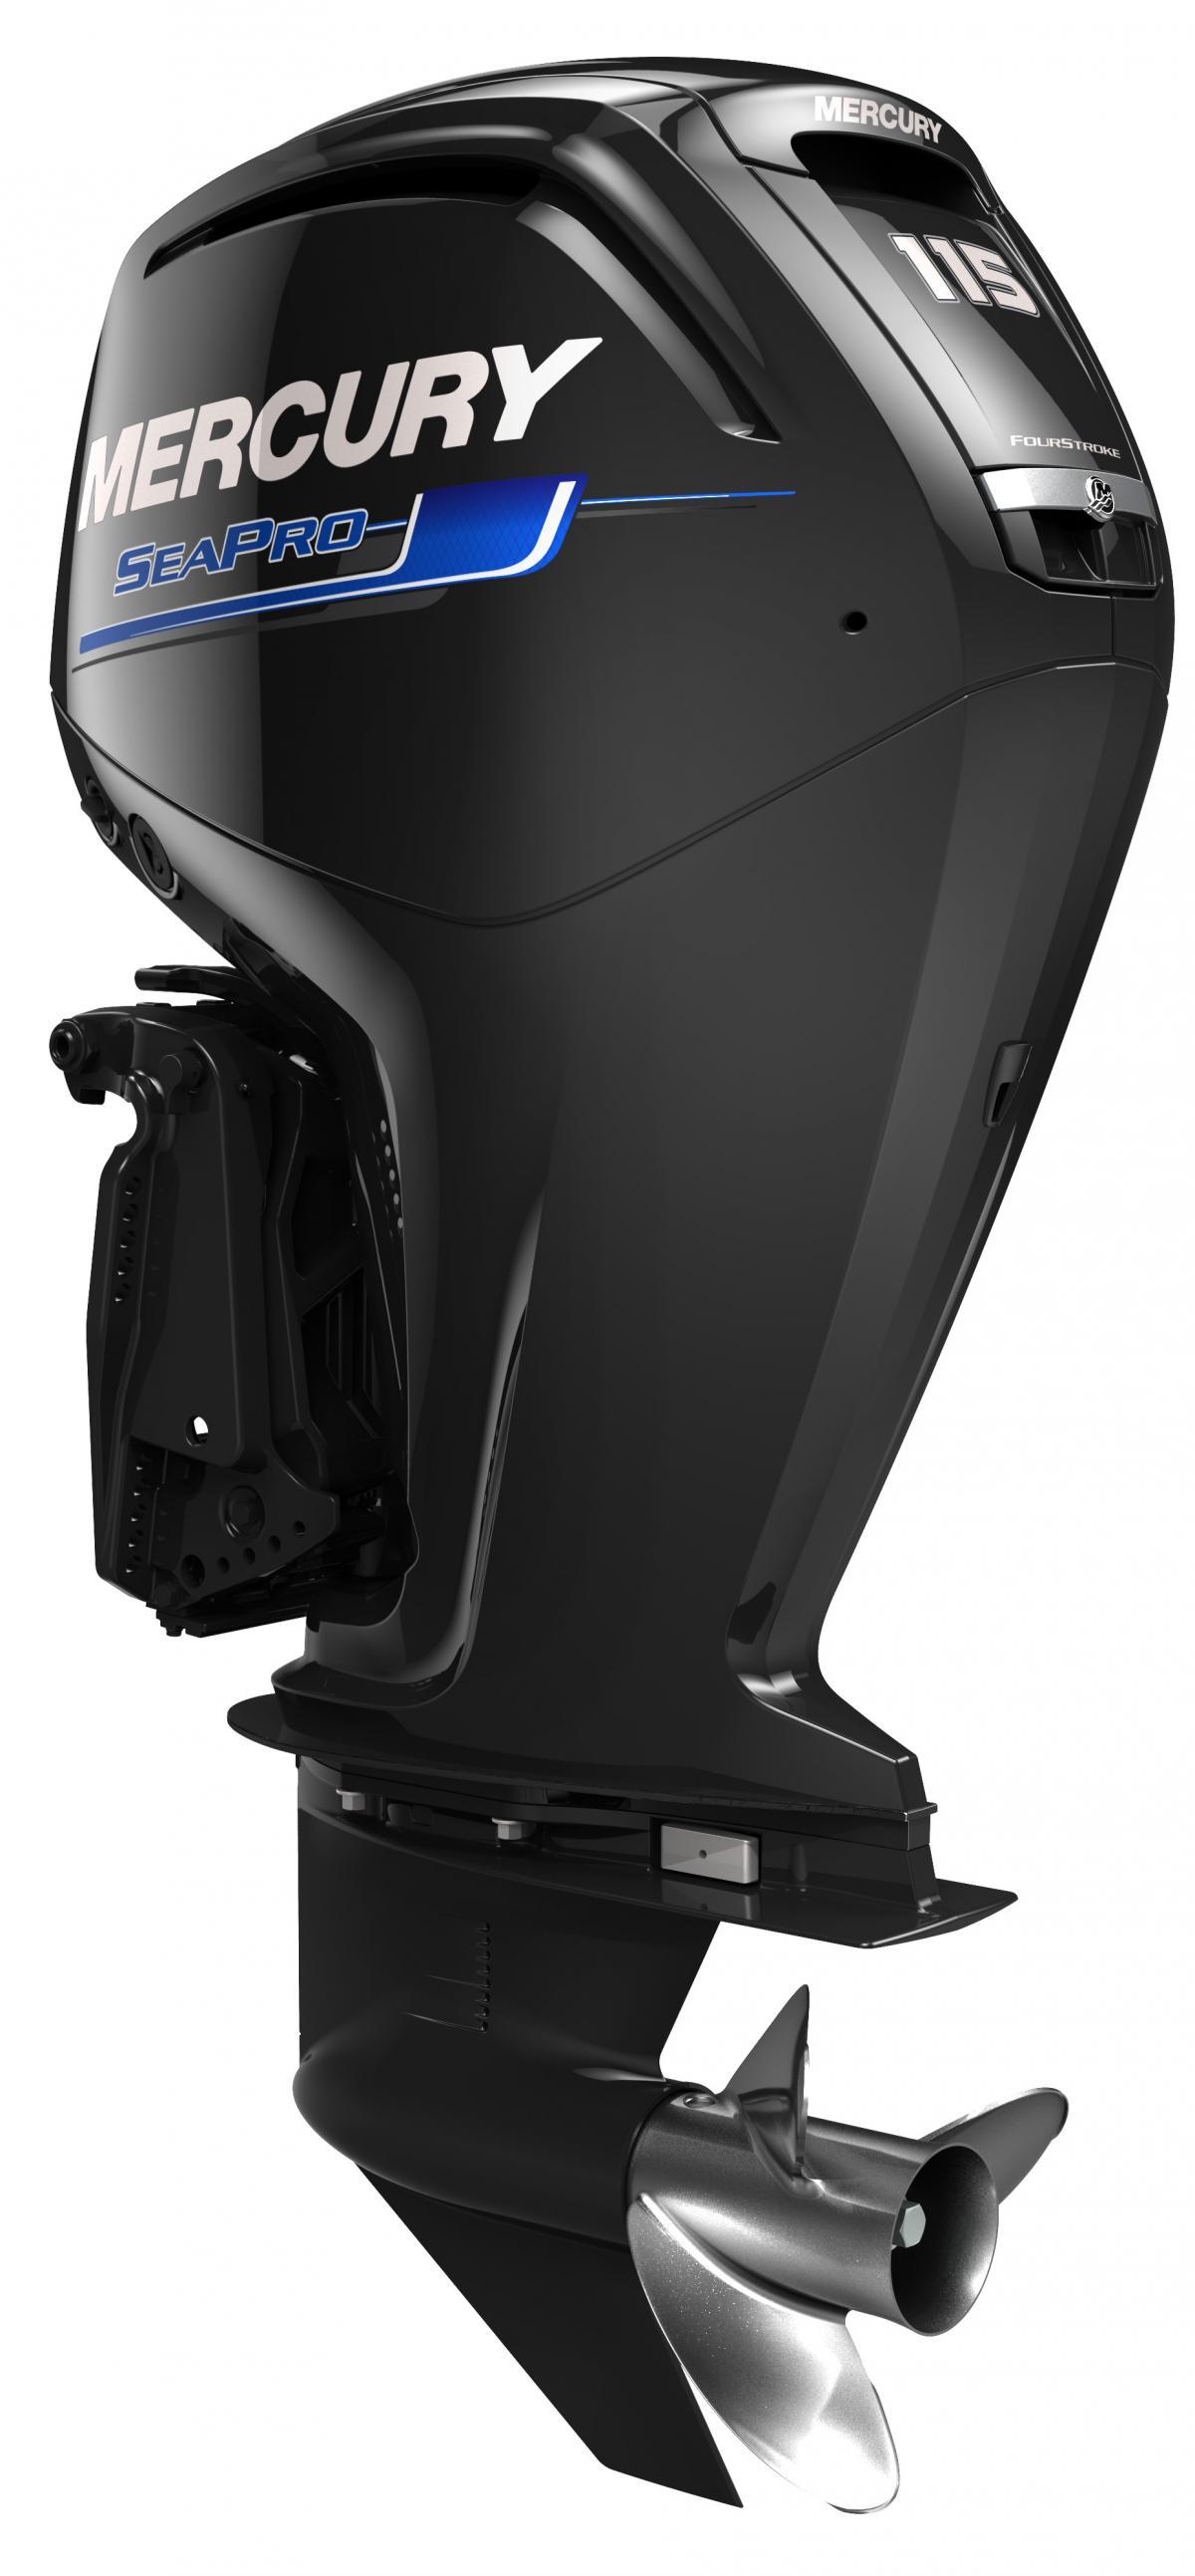 Mercury 115 HP Sea Pro Fourstroke